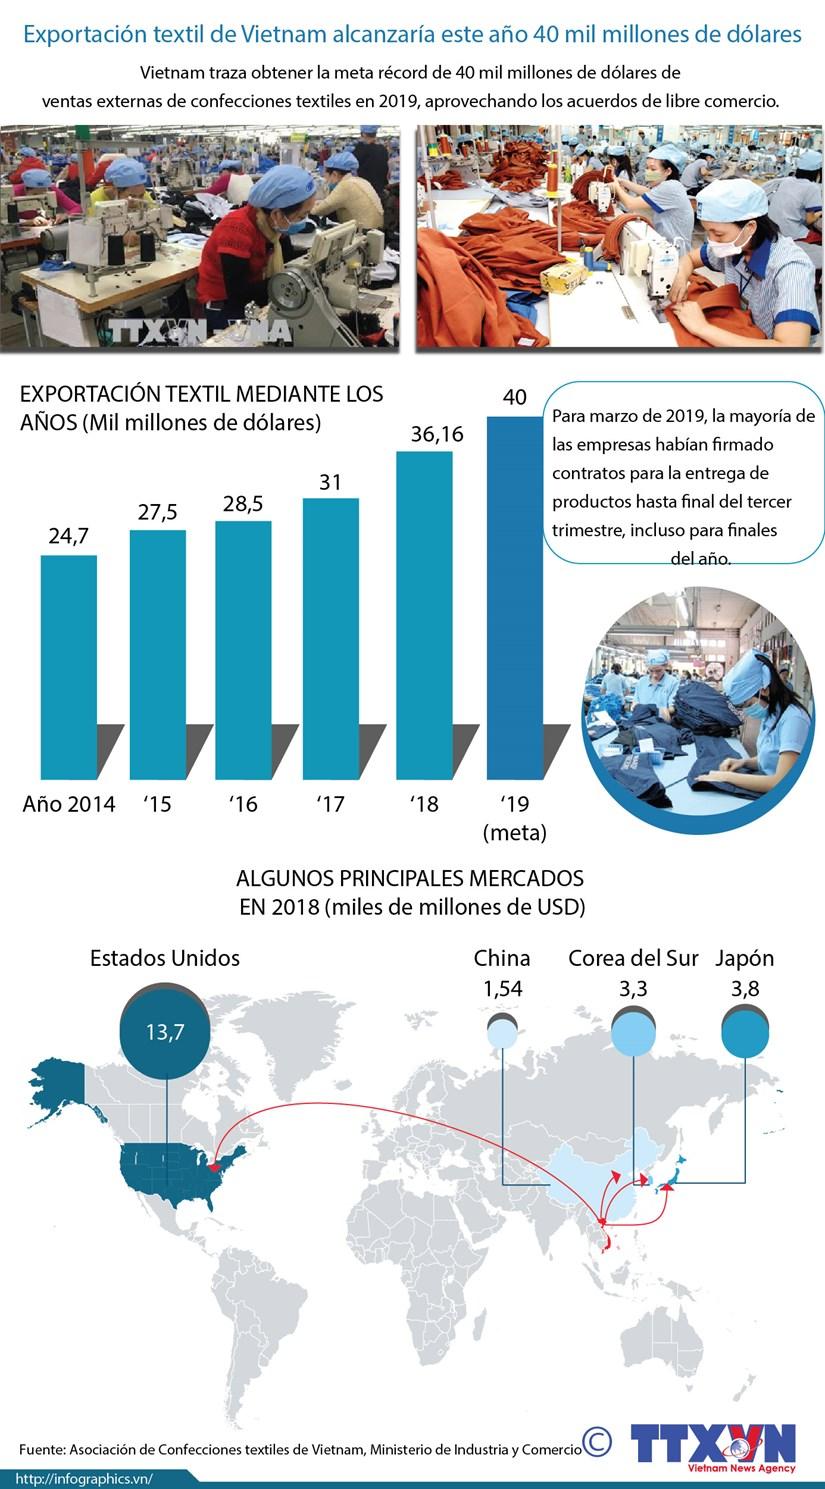 [Info] Exportacion textil de Vietnam alcanzaria este ano 40 mil millones de dolares hinh anh 1